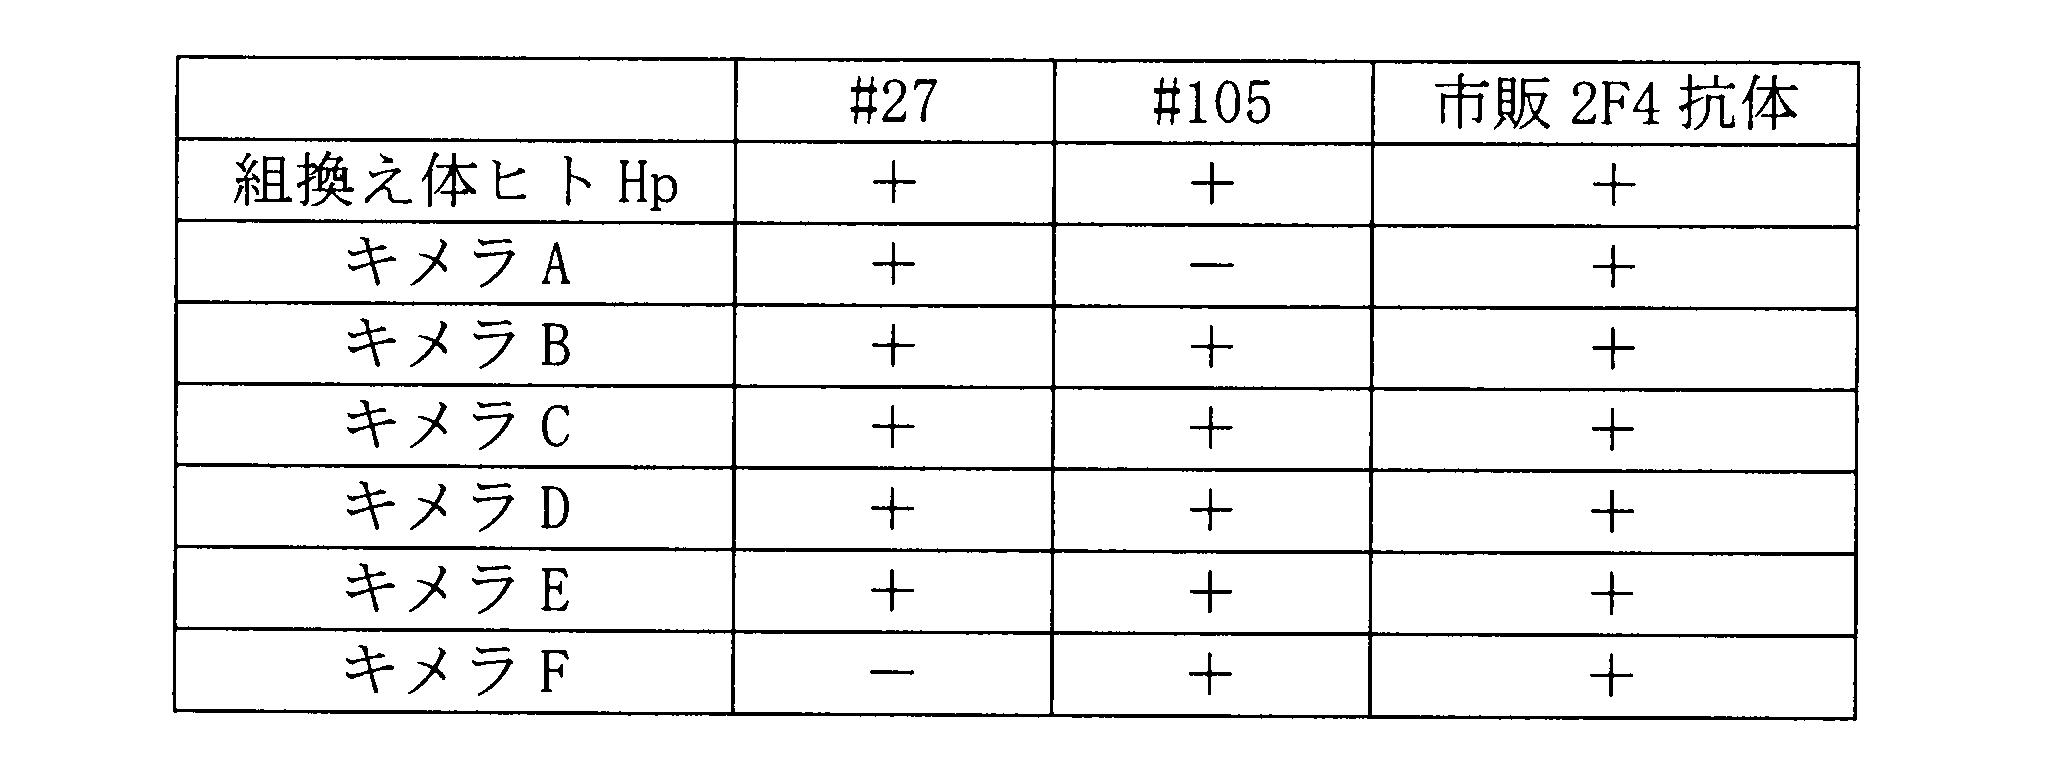 HP CD16B WINDOWS 8 X64 DRIVER DOWNLOAD